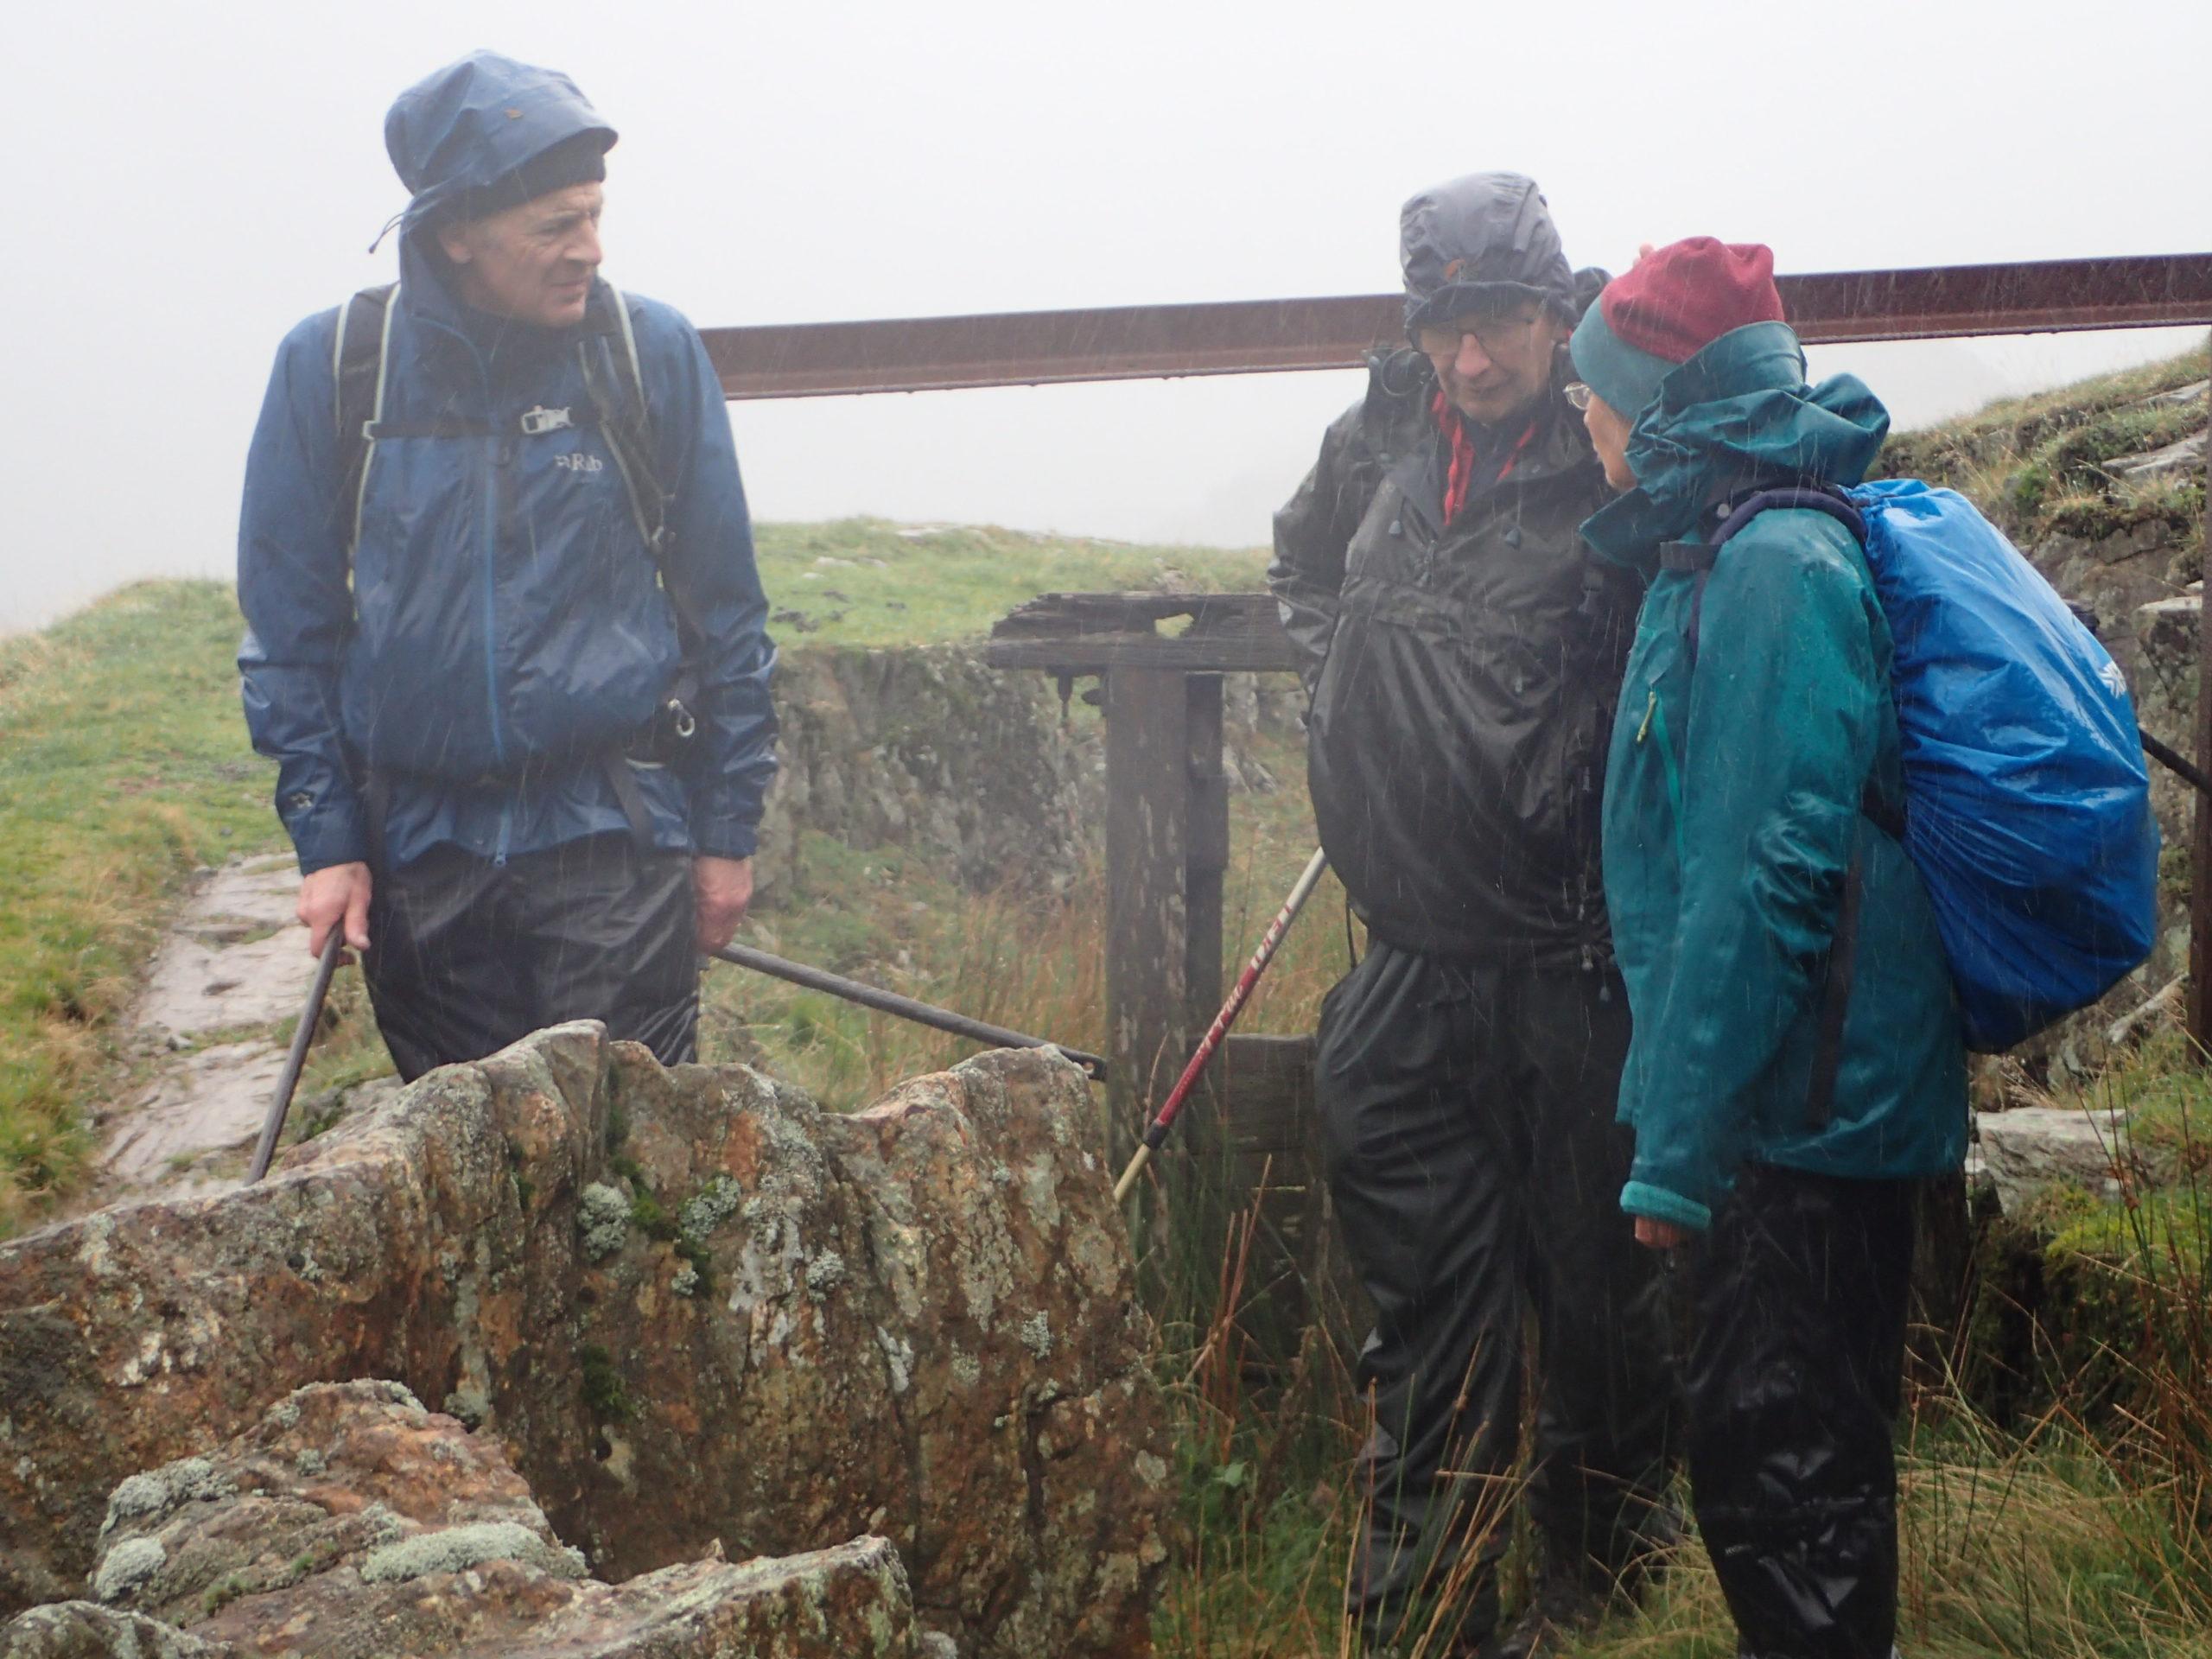 Raining at the sluice gate